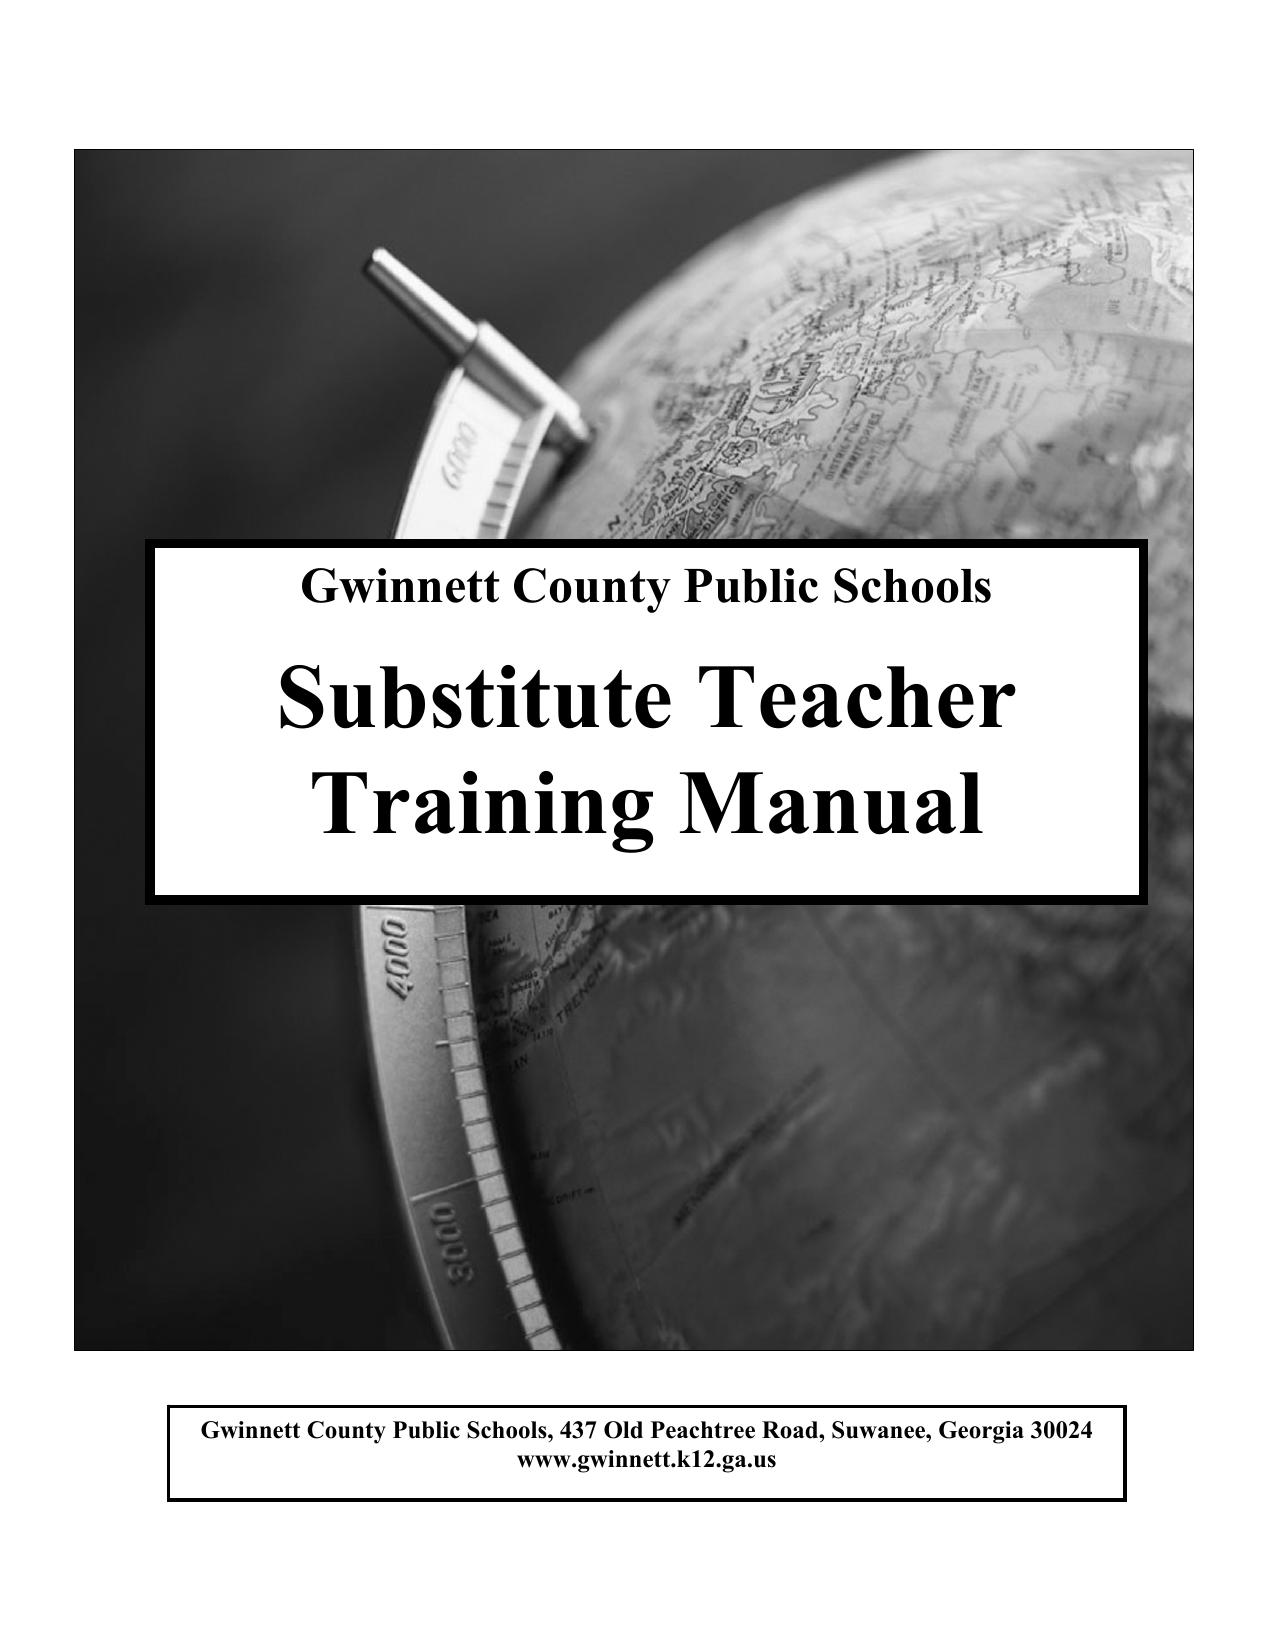 Gwinnett County Public Schools Substitute Teacher Training